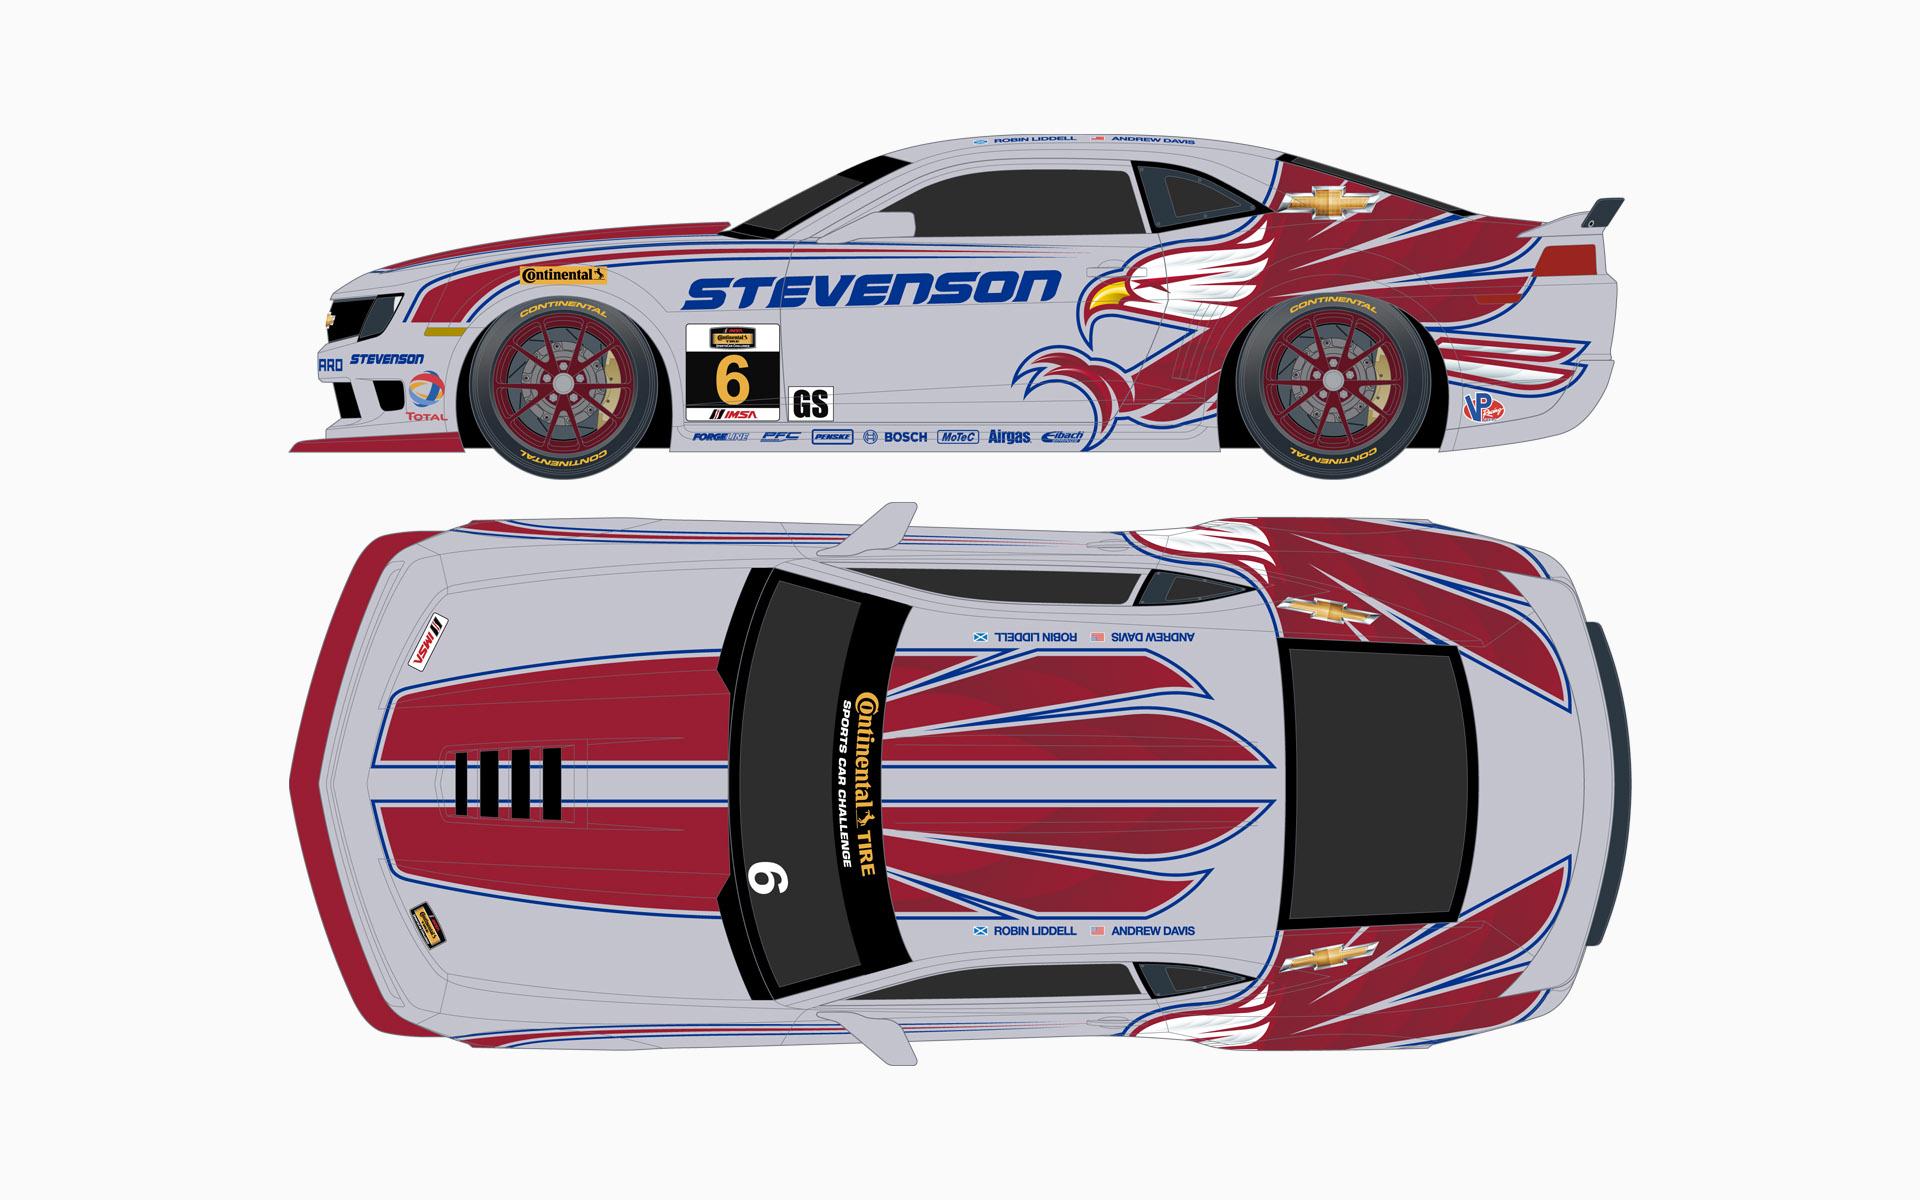 2014 Stevenson Motorsports Chevy Camaro Z28R GT Livery Elevations